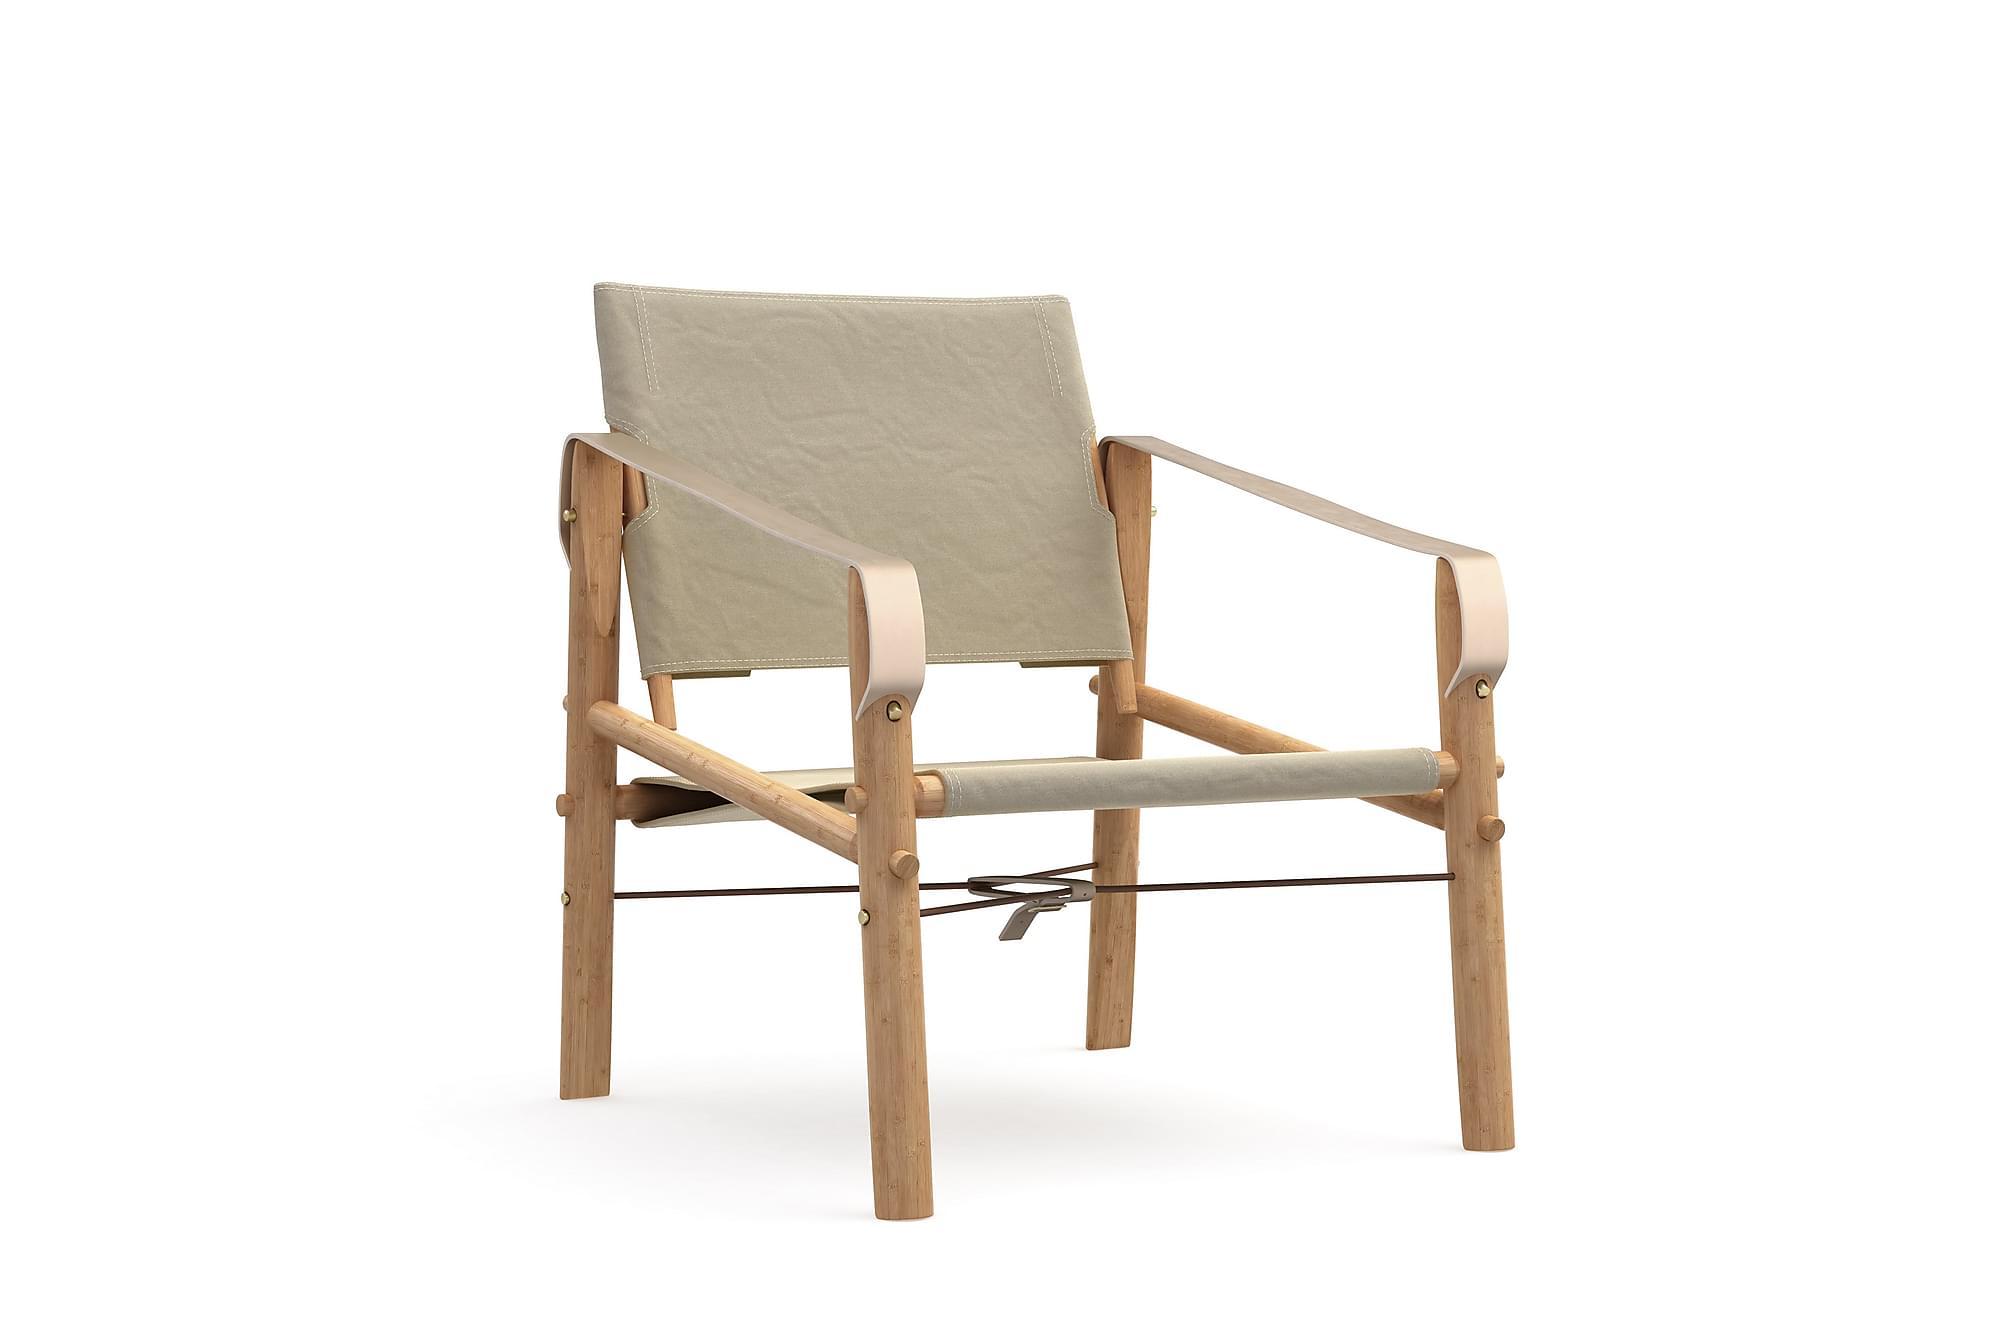 KARIM Stol Beige/Bambu, Matstolar